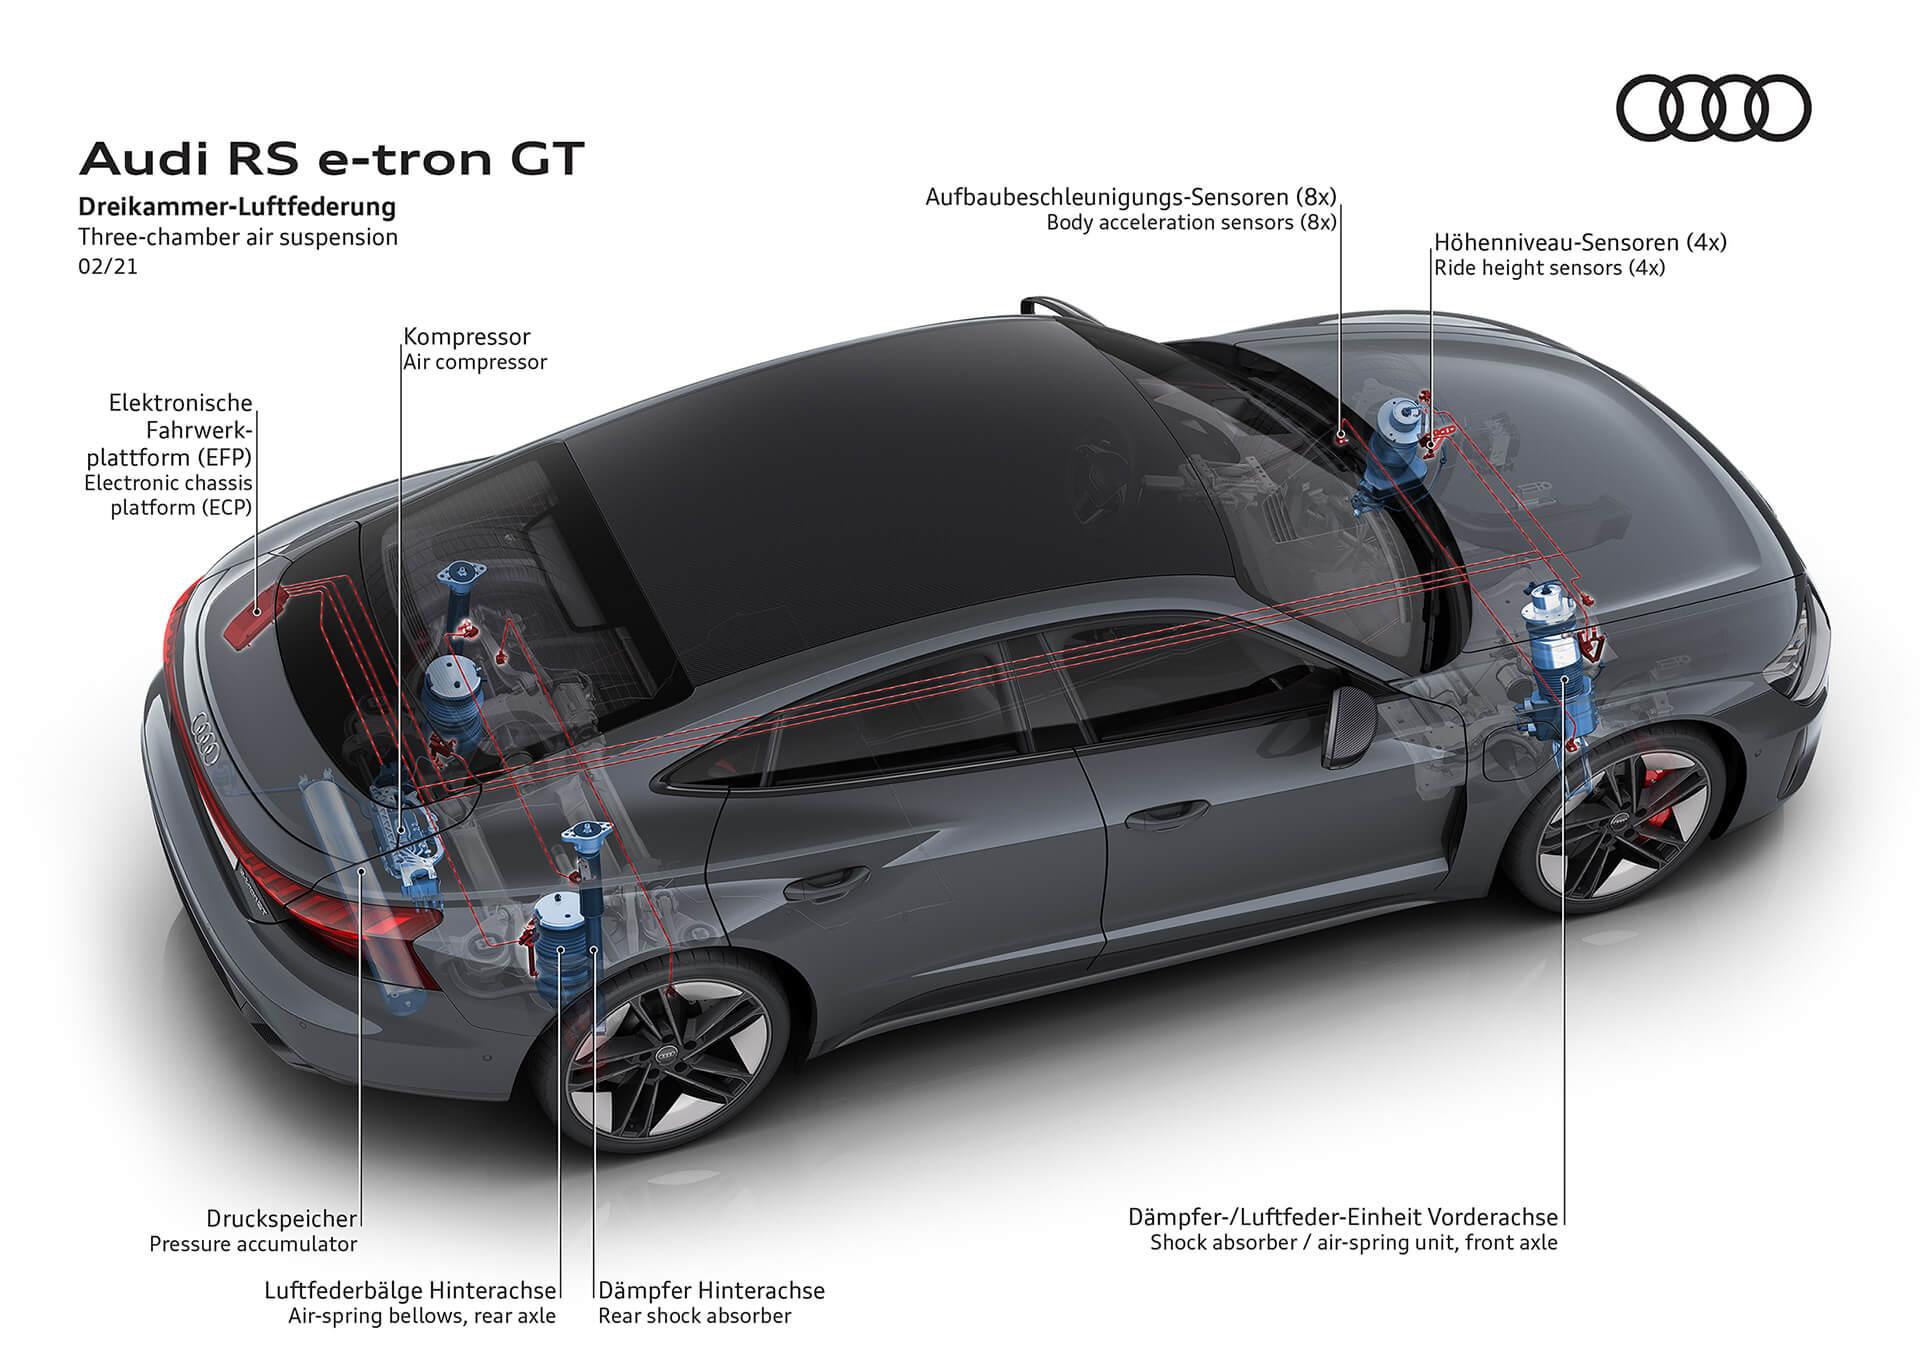 Audi RS e-tron GT - Ανάρτηση